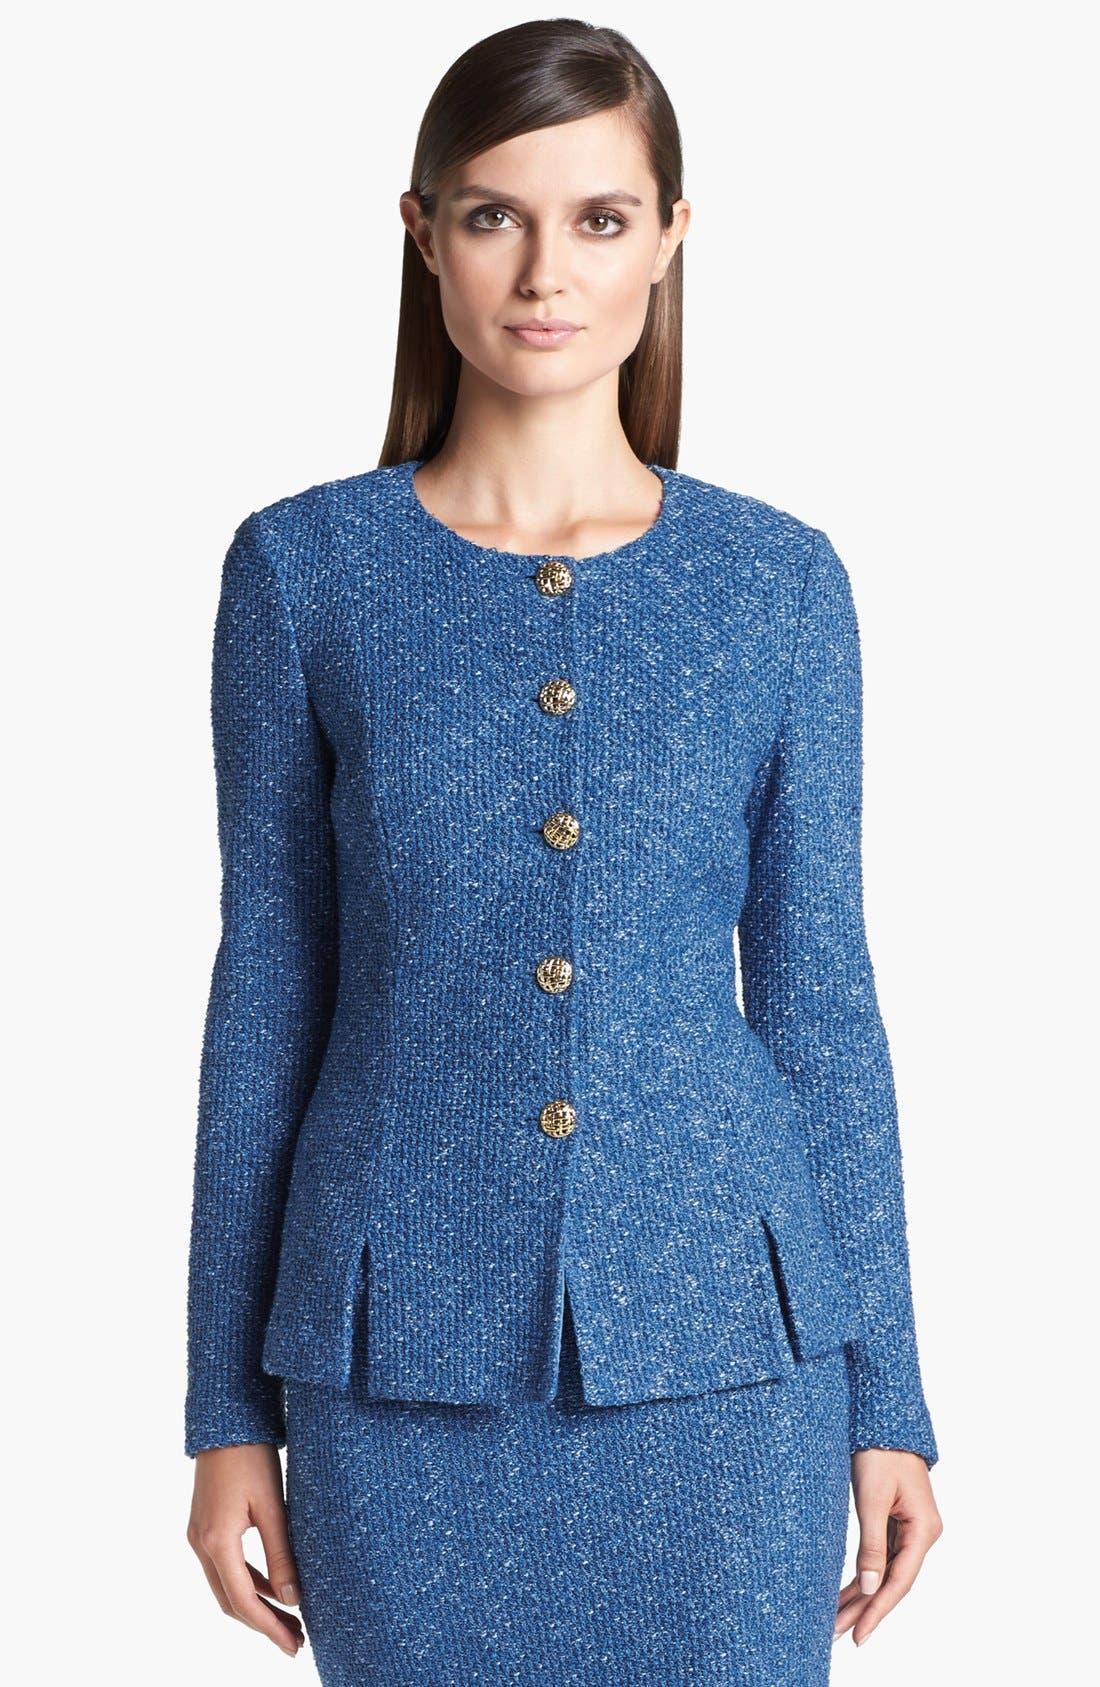 Main Image - St. John Collection Flecked Tweed Jacket